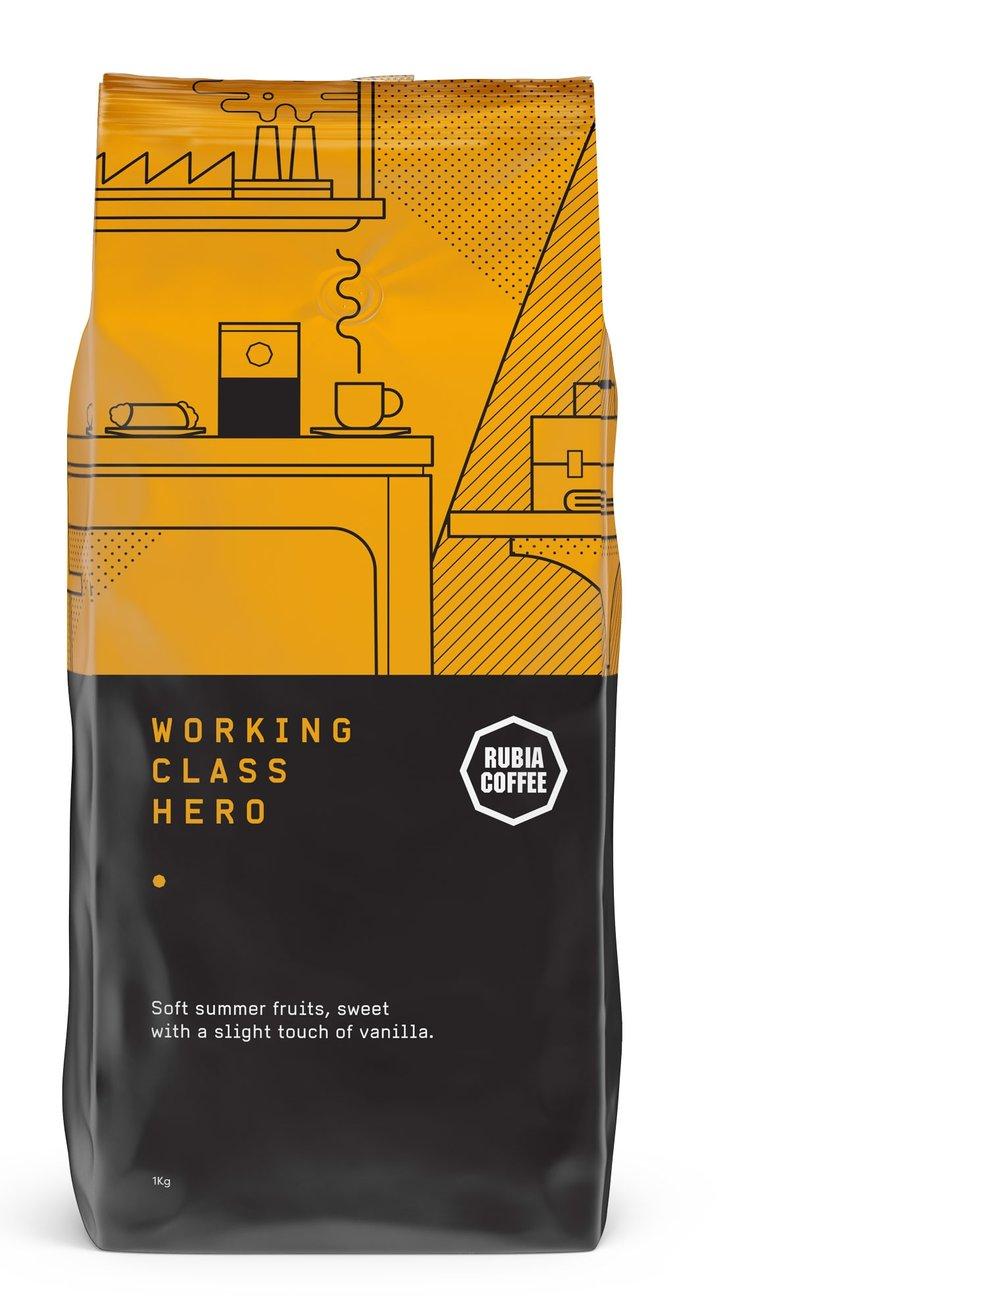 Rubia Coffee Working Class Hero coffee blend